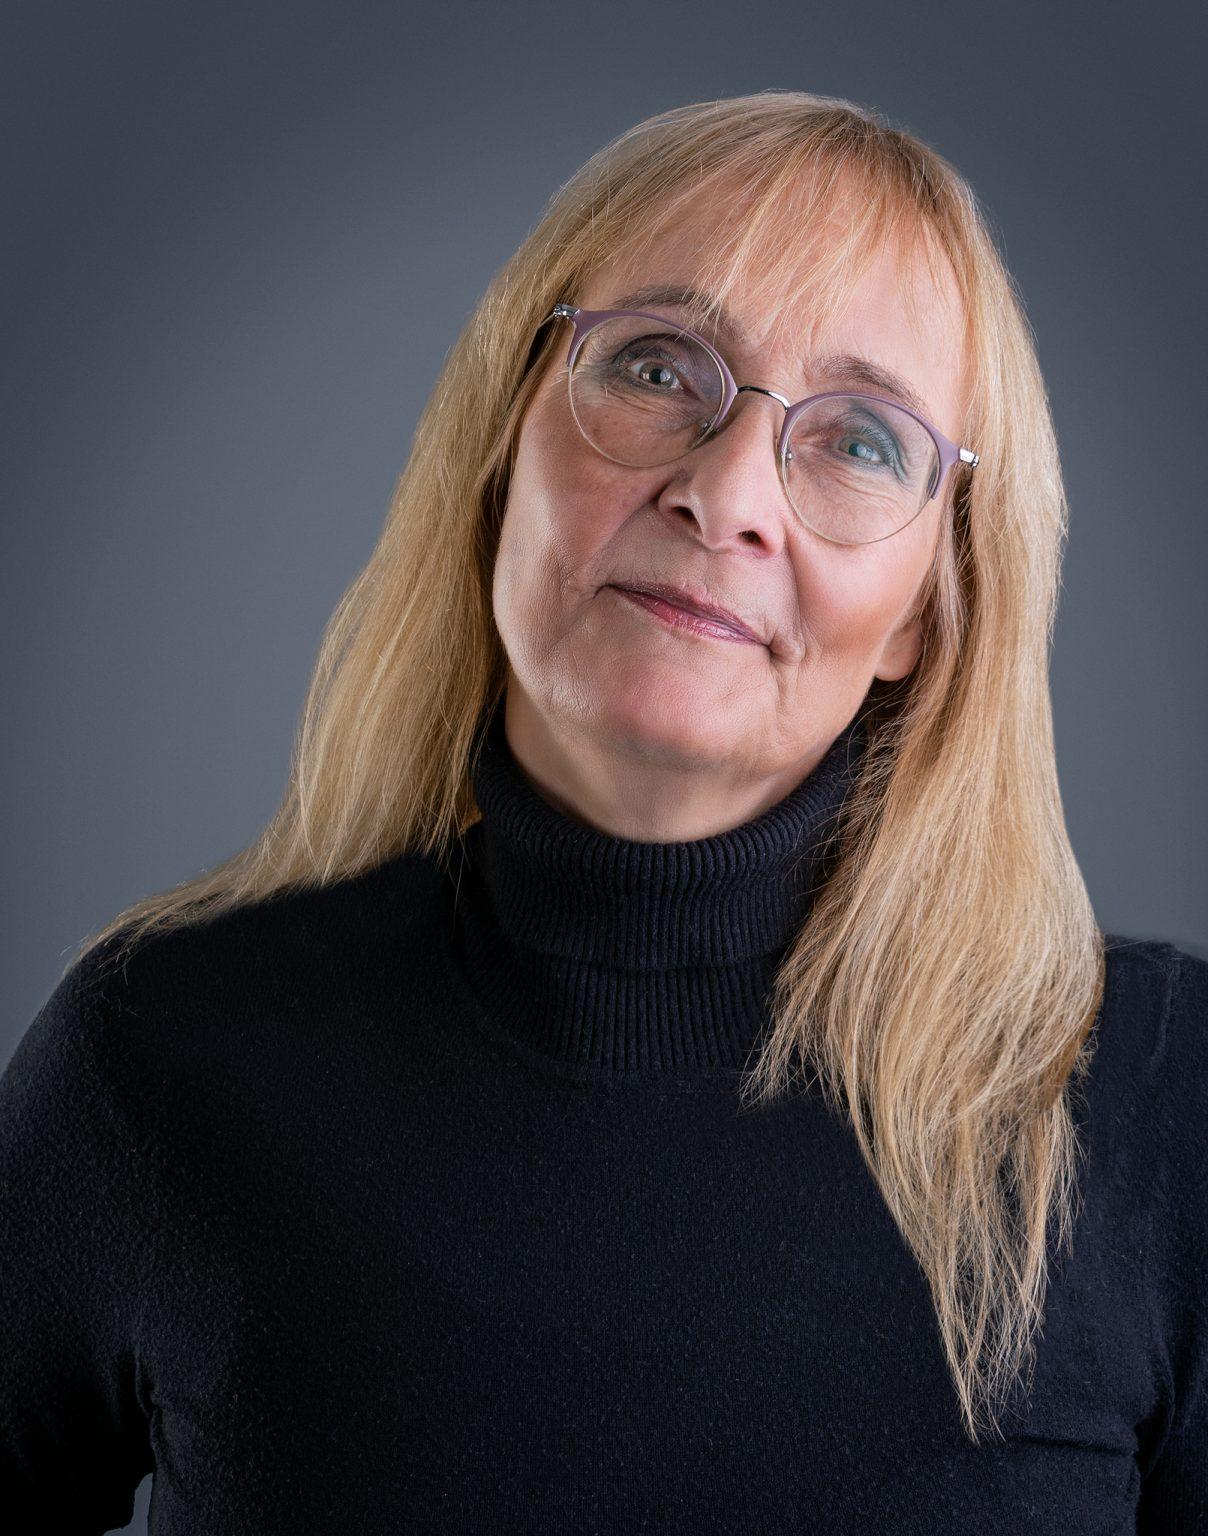 Yvonne Kostwinder - Portret